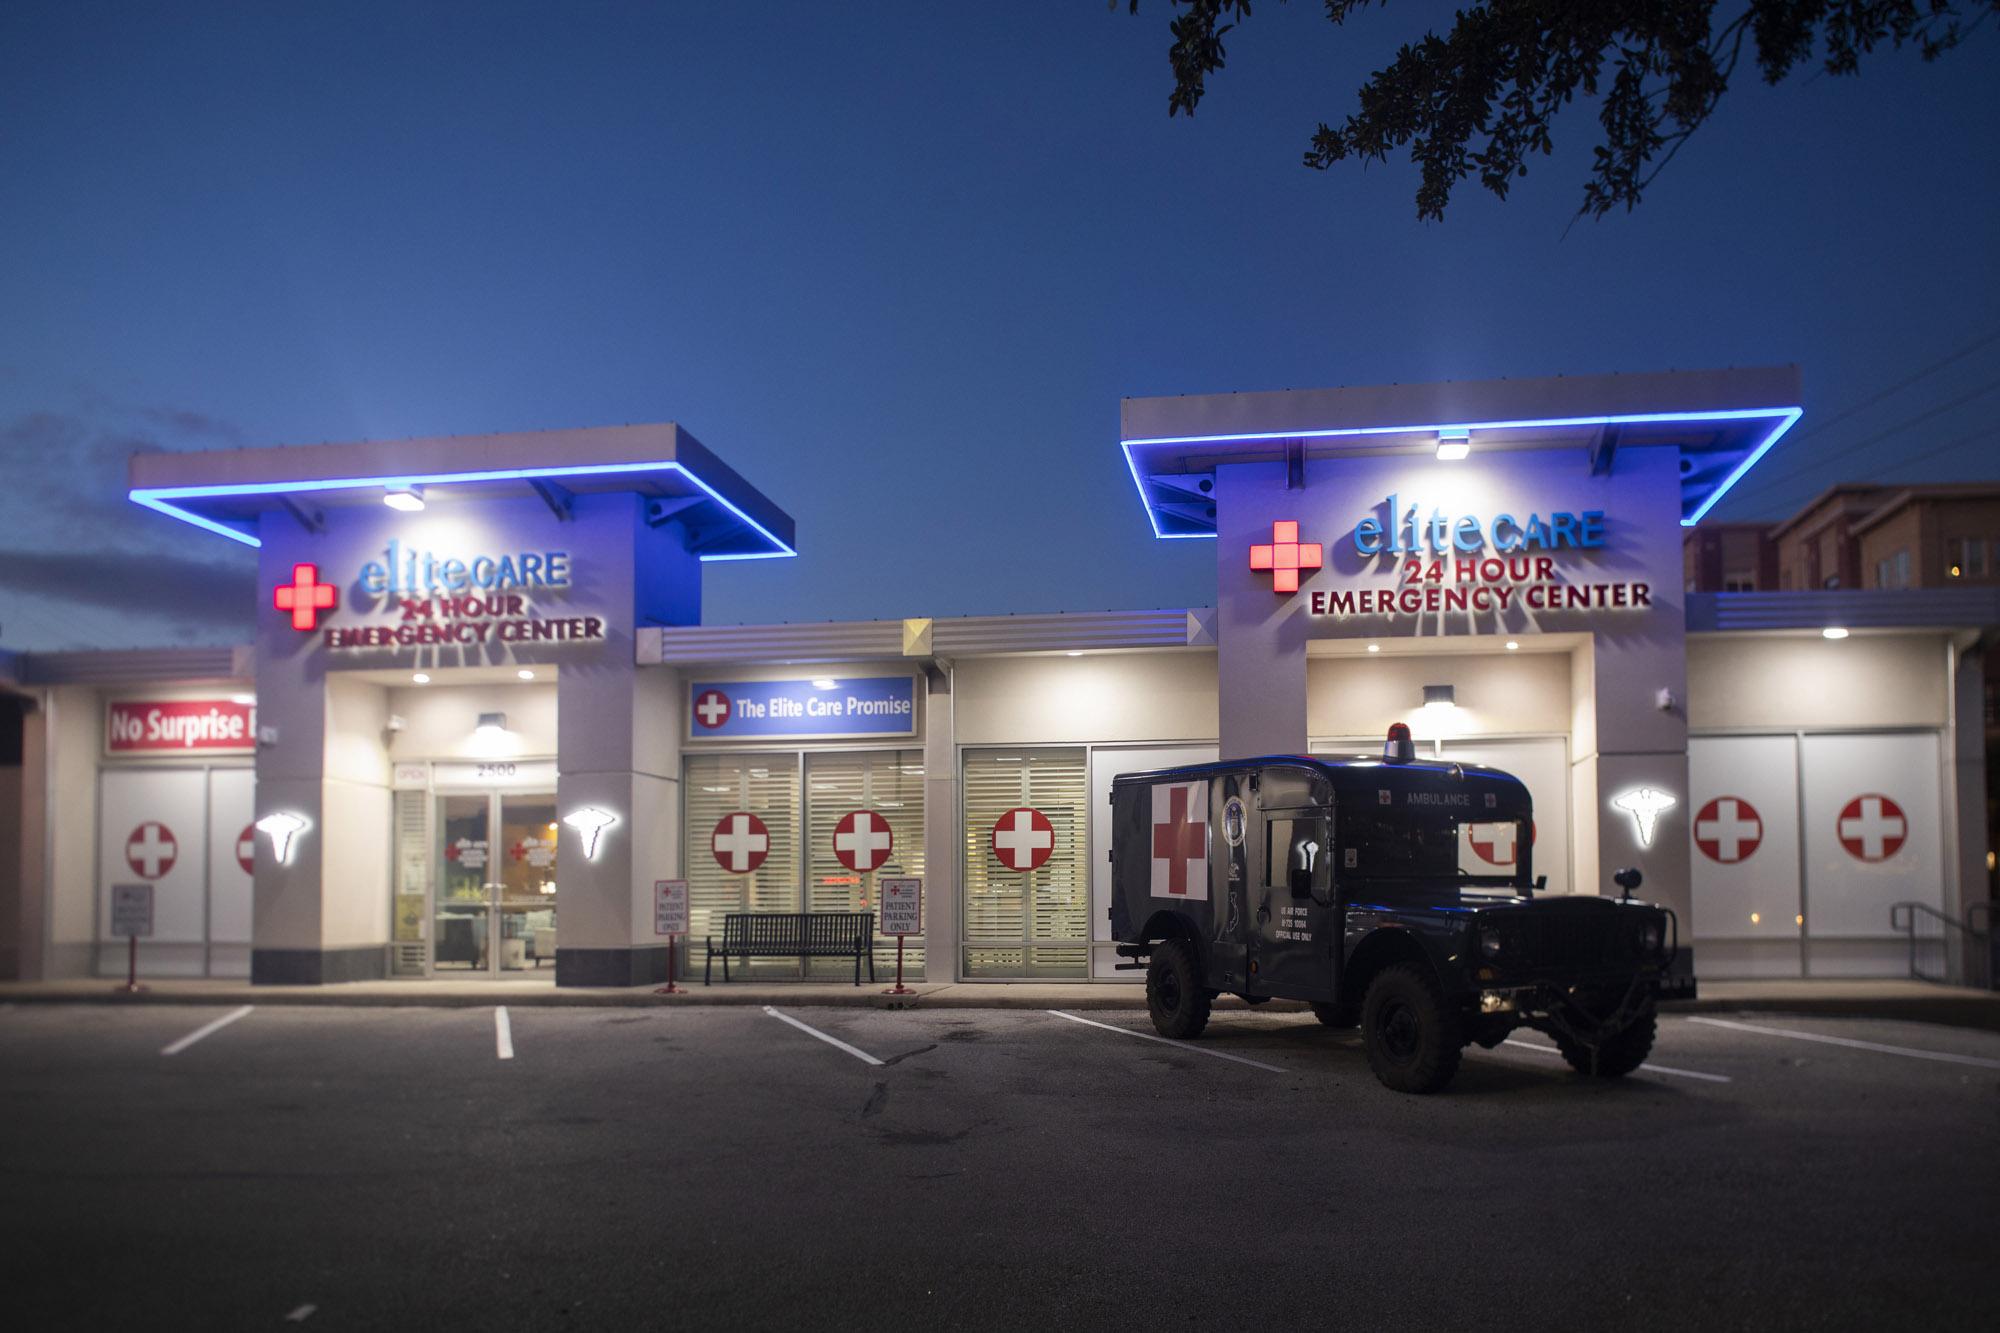 Elite Care 24 Hour Emergency Room - Houston Texas